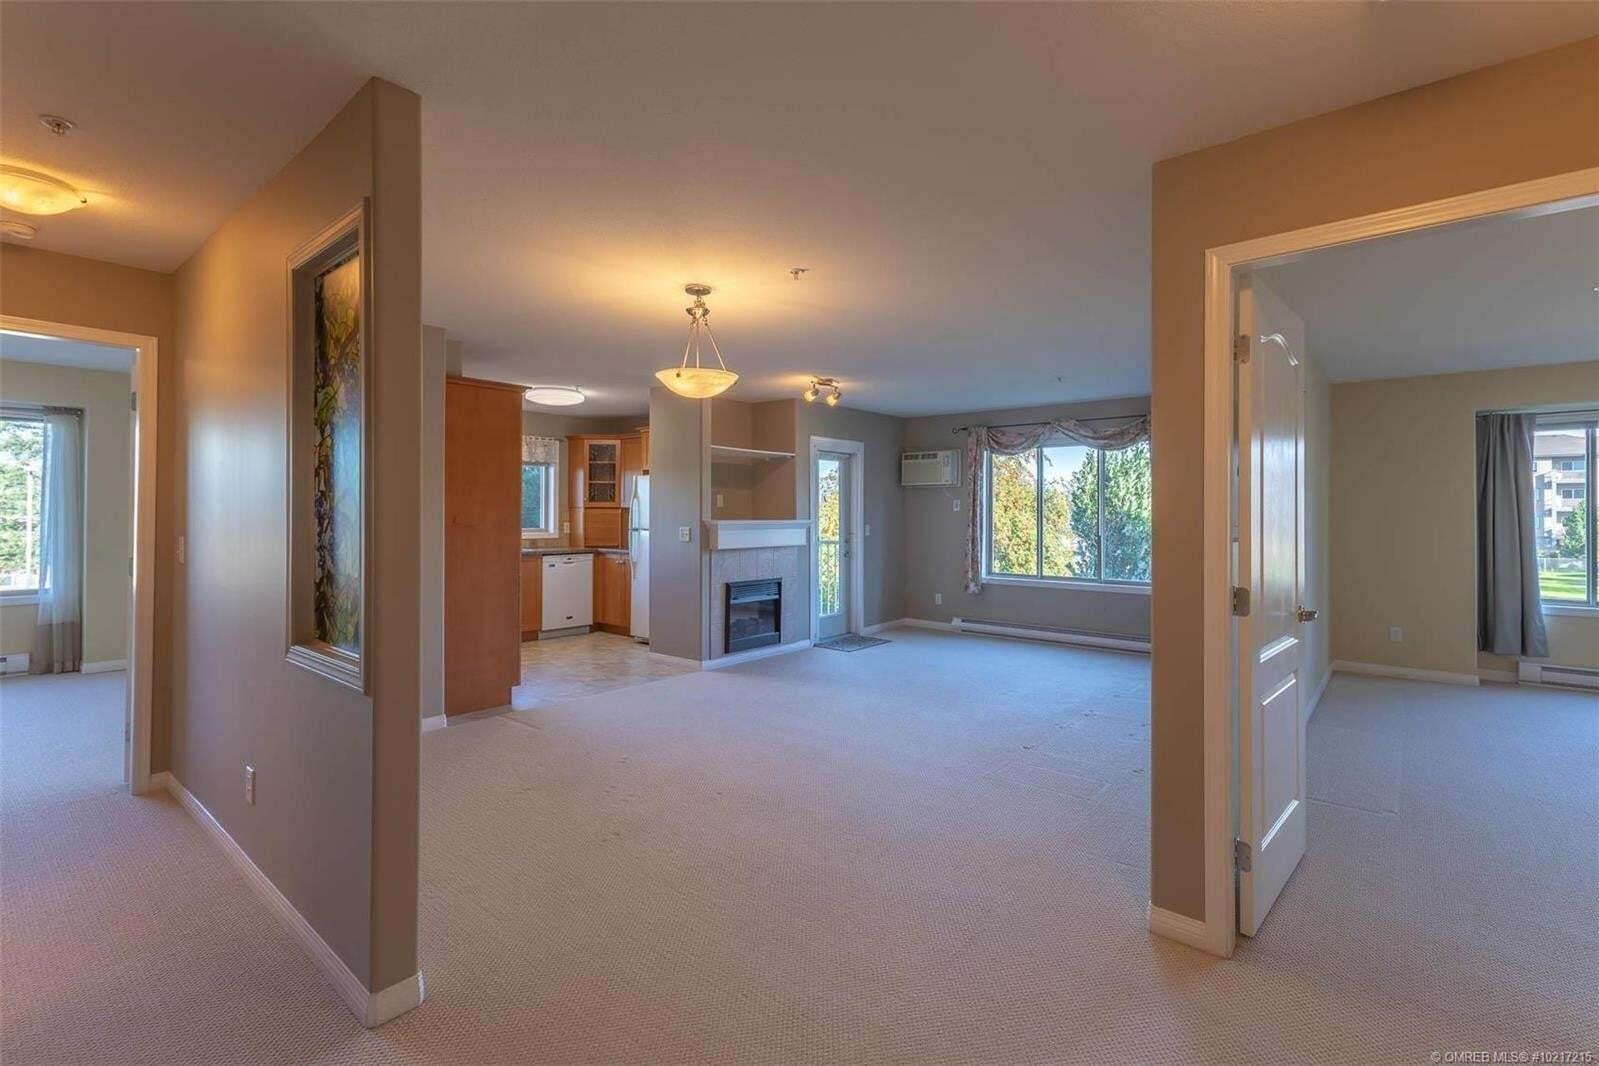 Condo for sale at 710 Rutland Rd North Unit 212 Kelowna British Columbia - MLS: 10217215